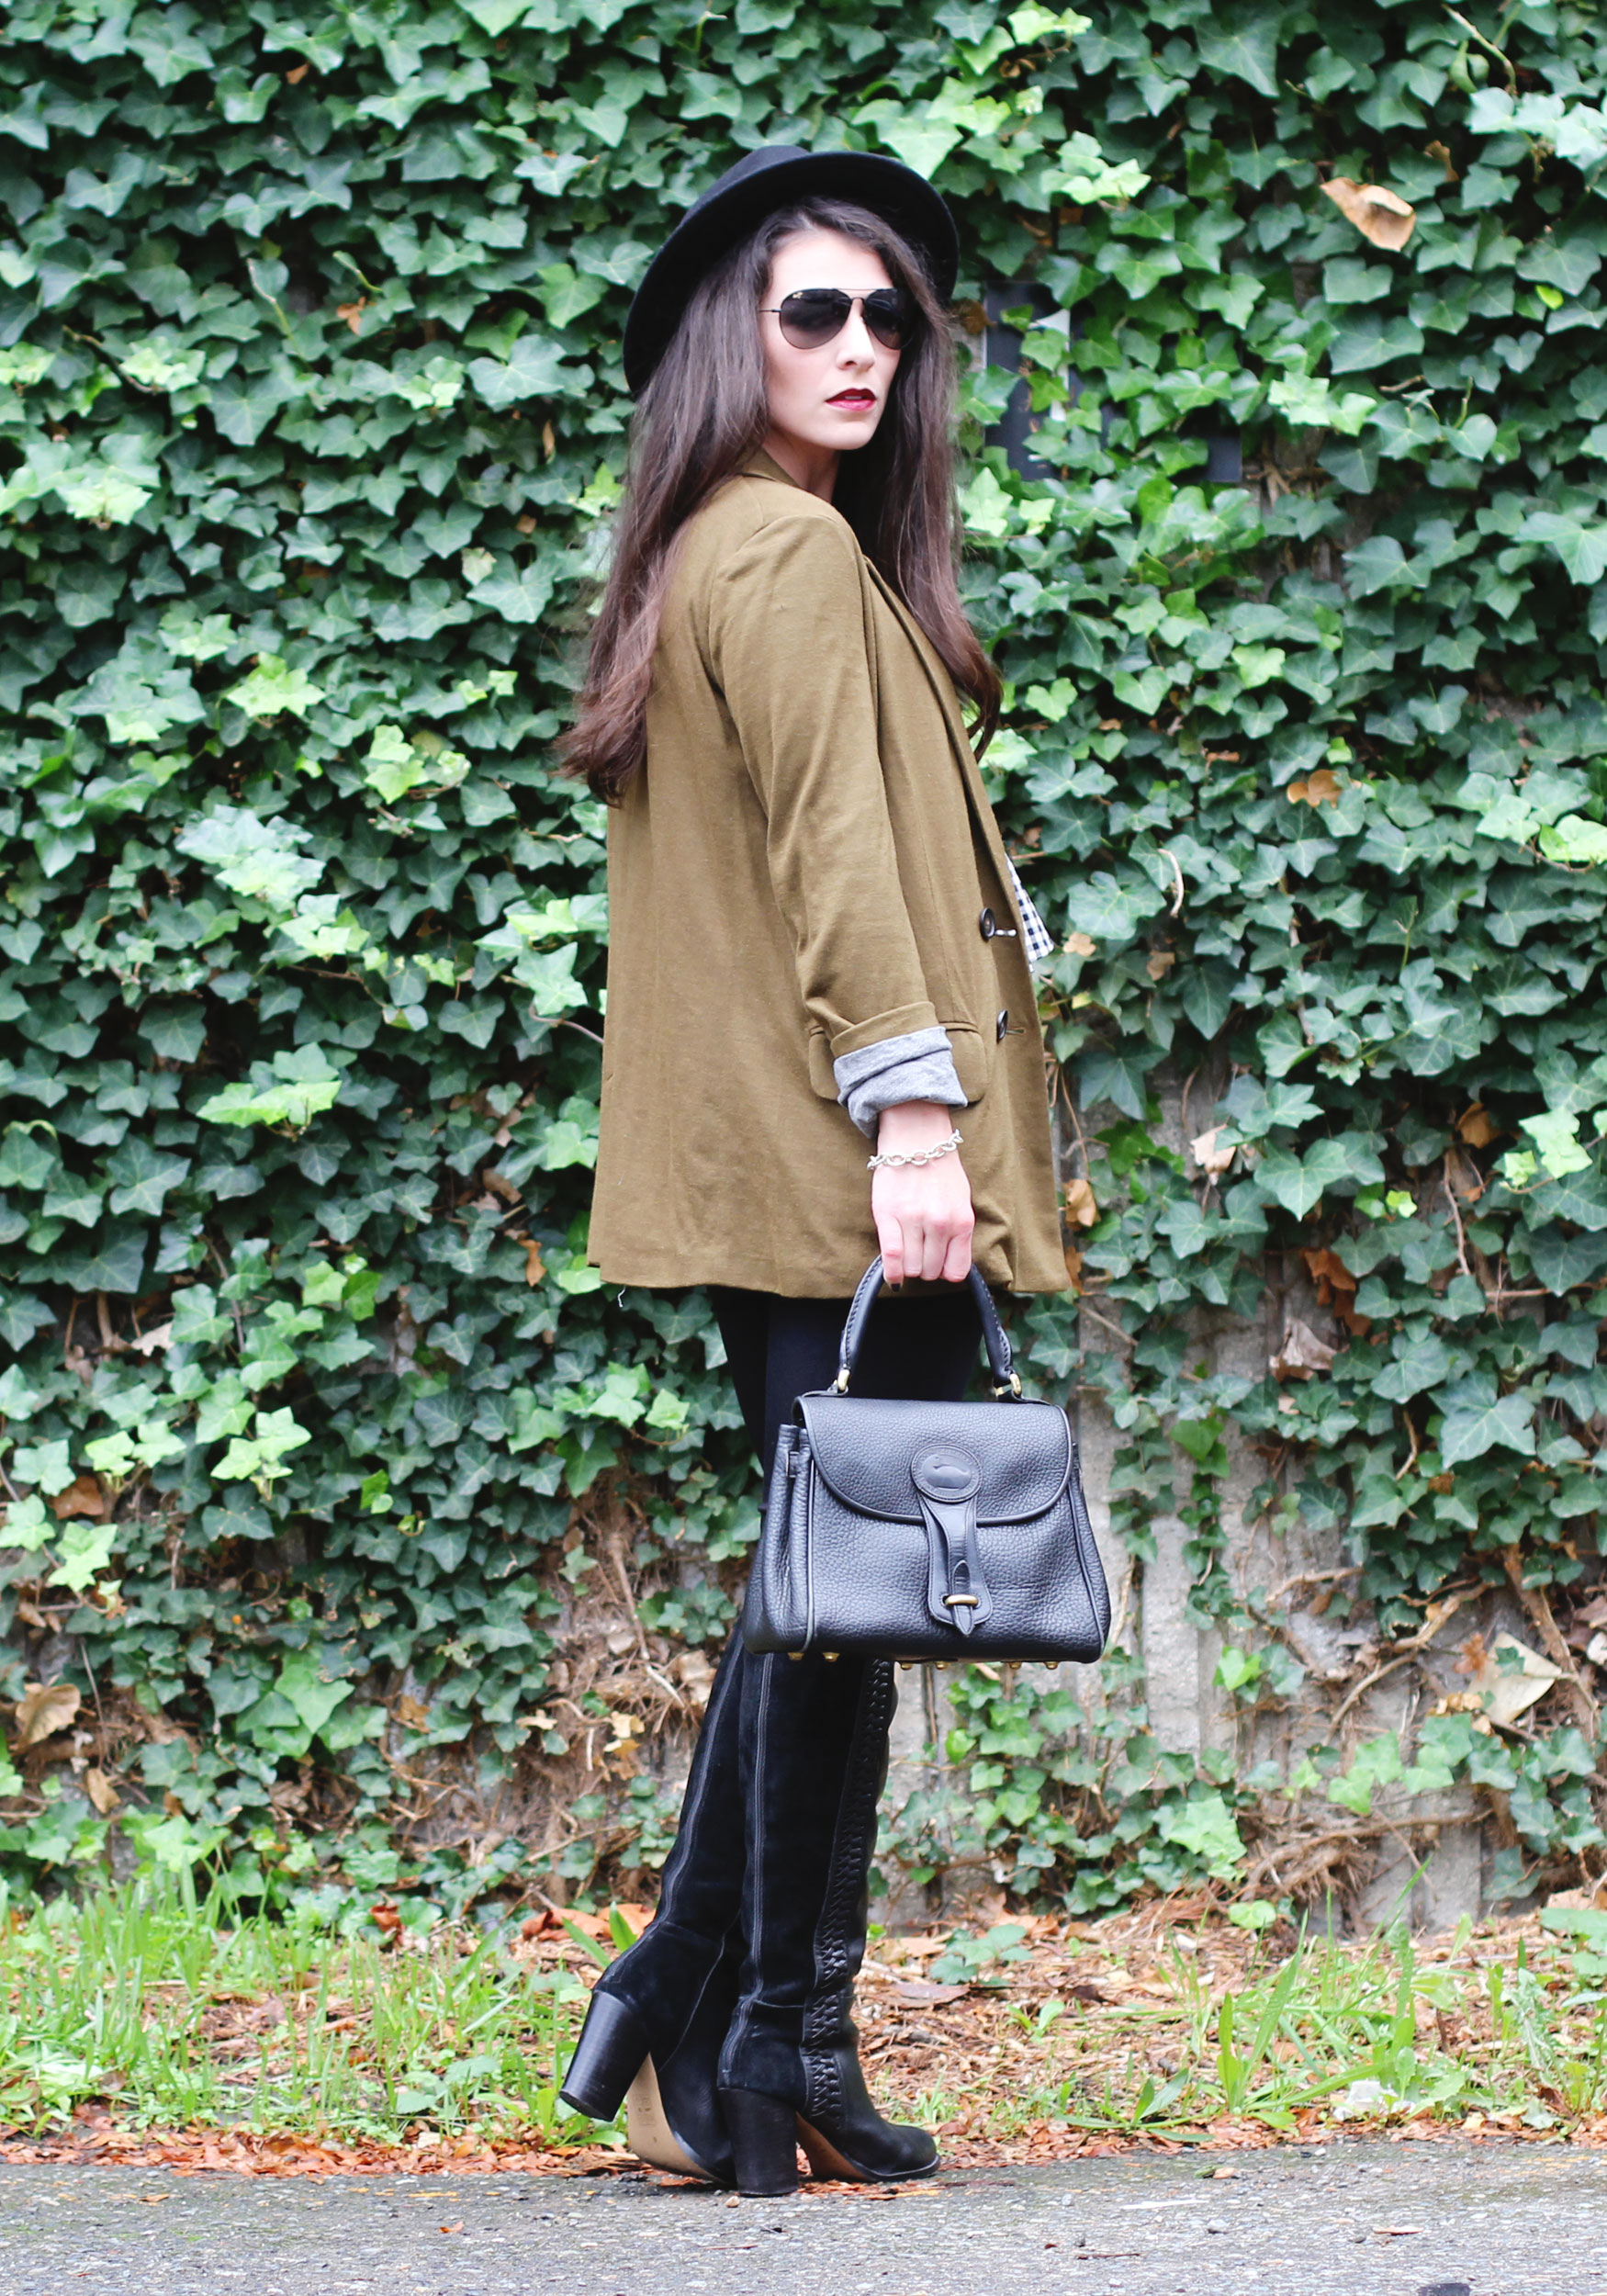 Fall Fashion, Dolce Vita Over The Knee Boots, Black Wool Fedora, J.Crew Jersey Blazer, and Zara Peplum Top